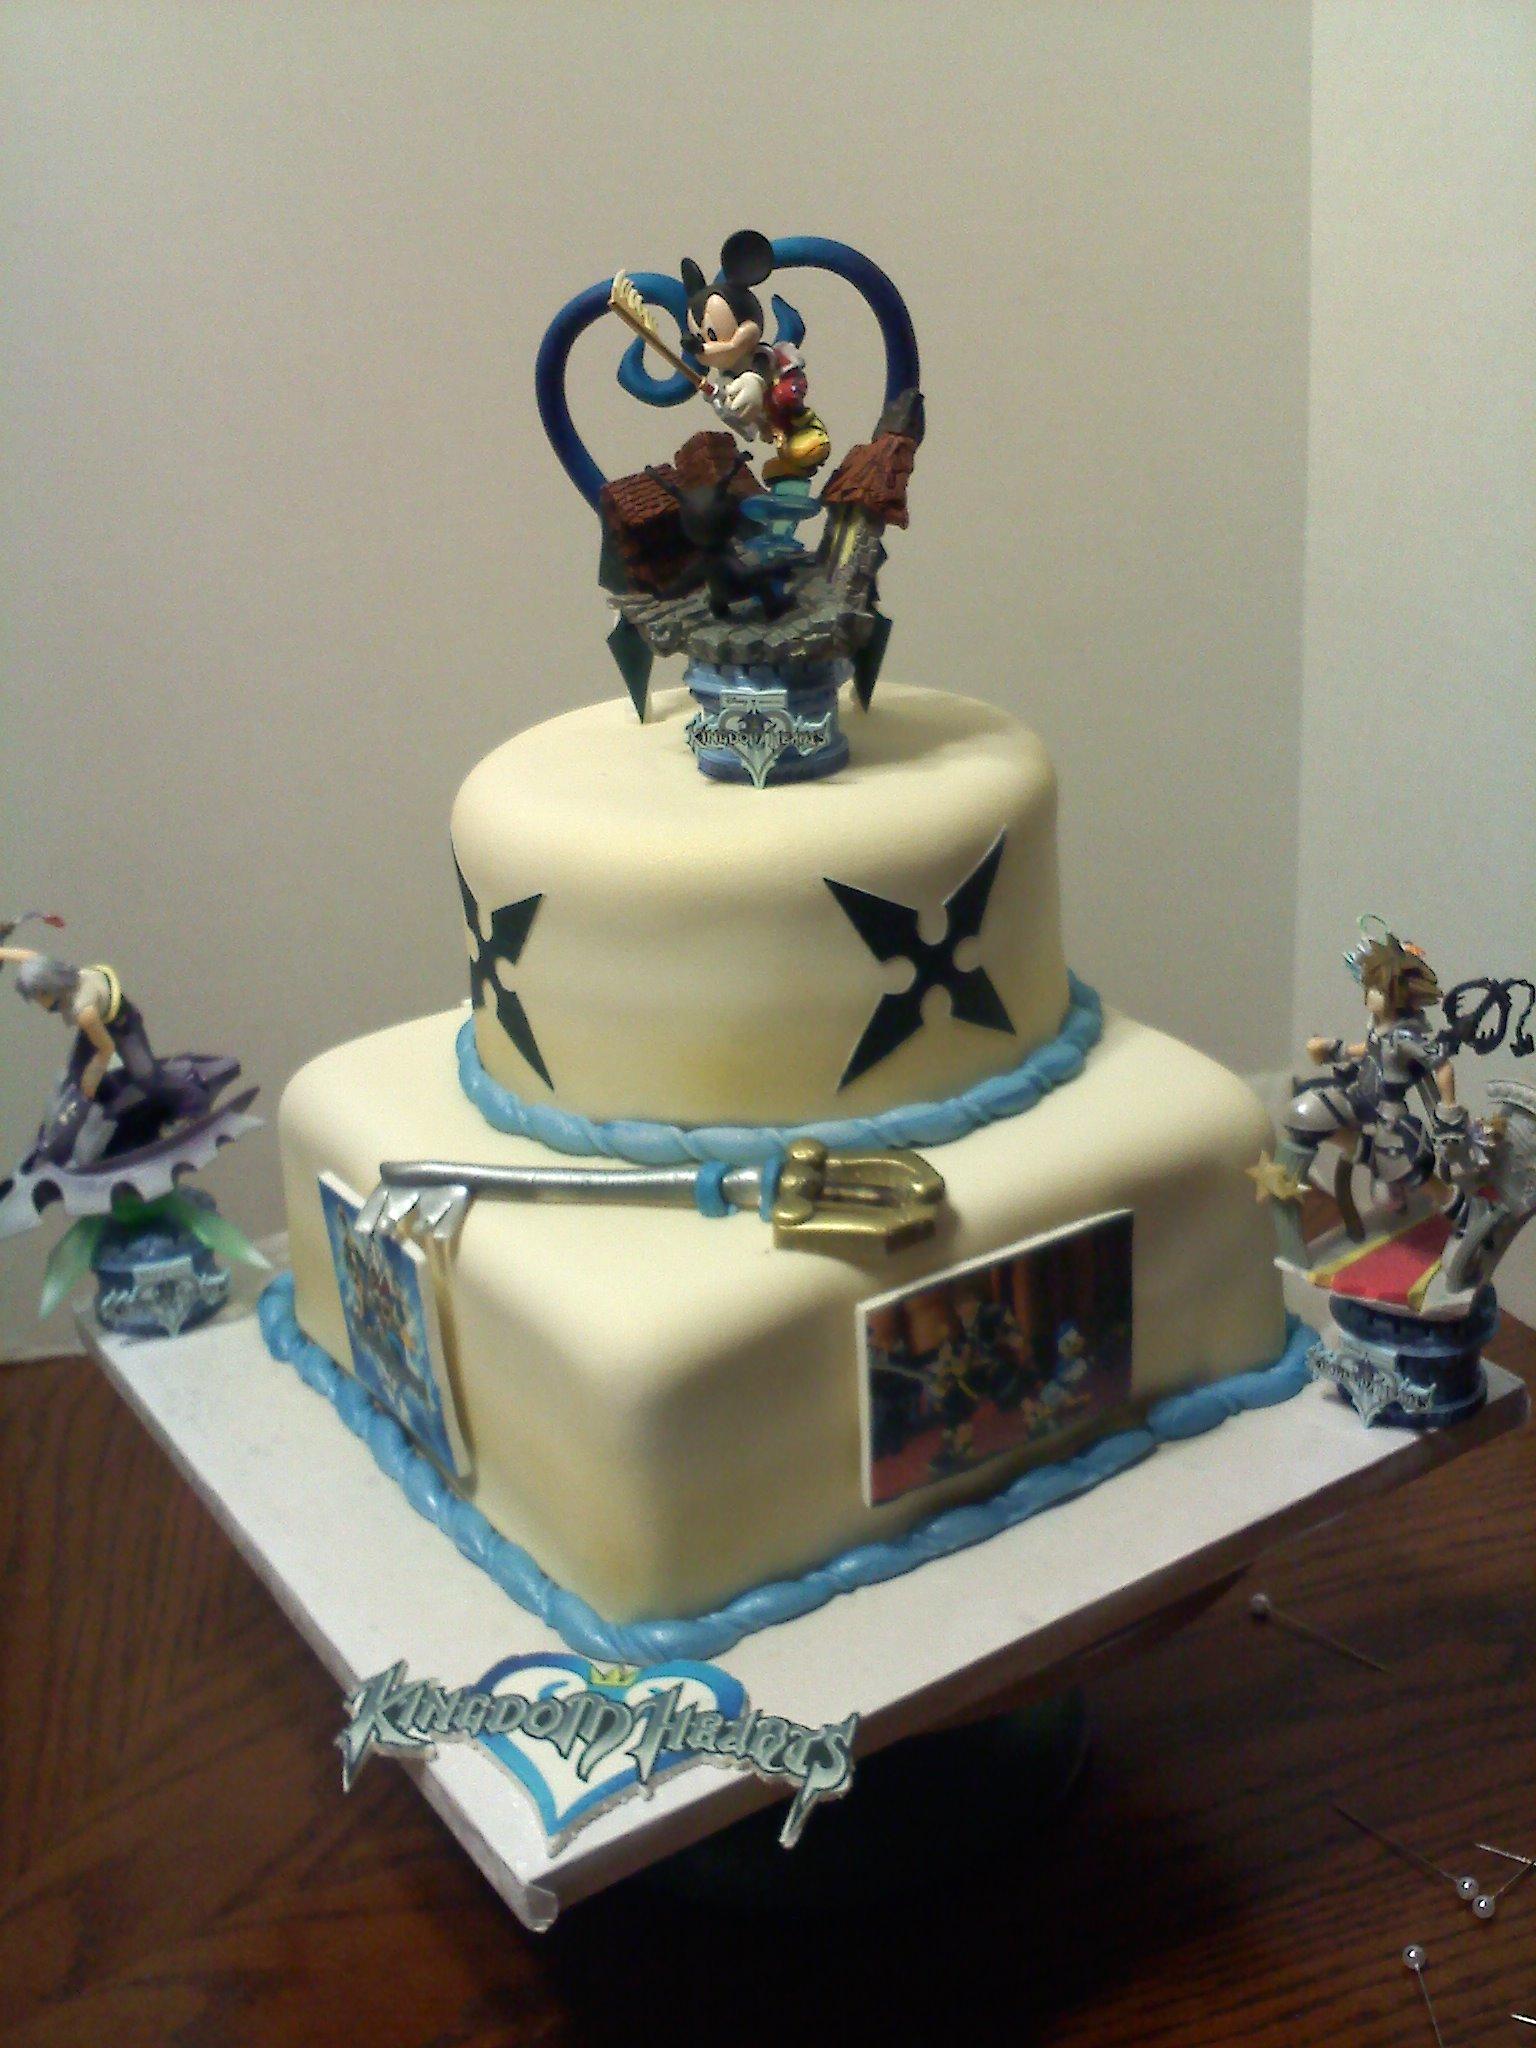 Kingdom Hearts Birthday Cake Toppers